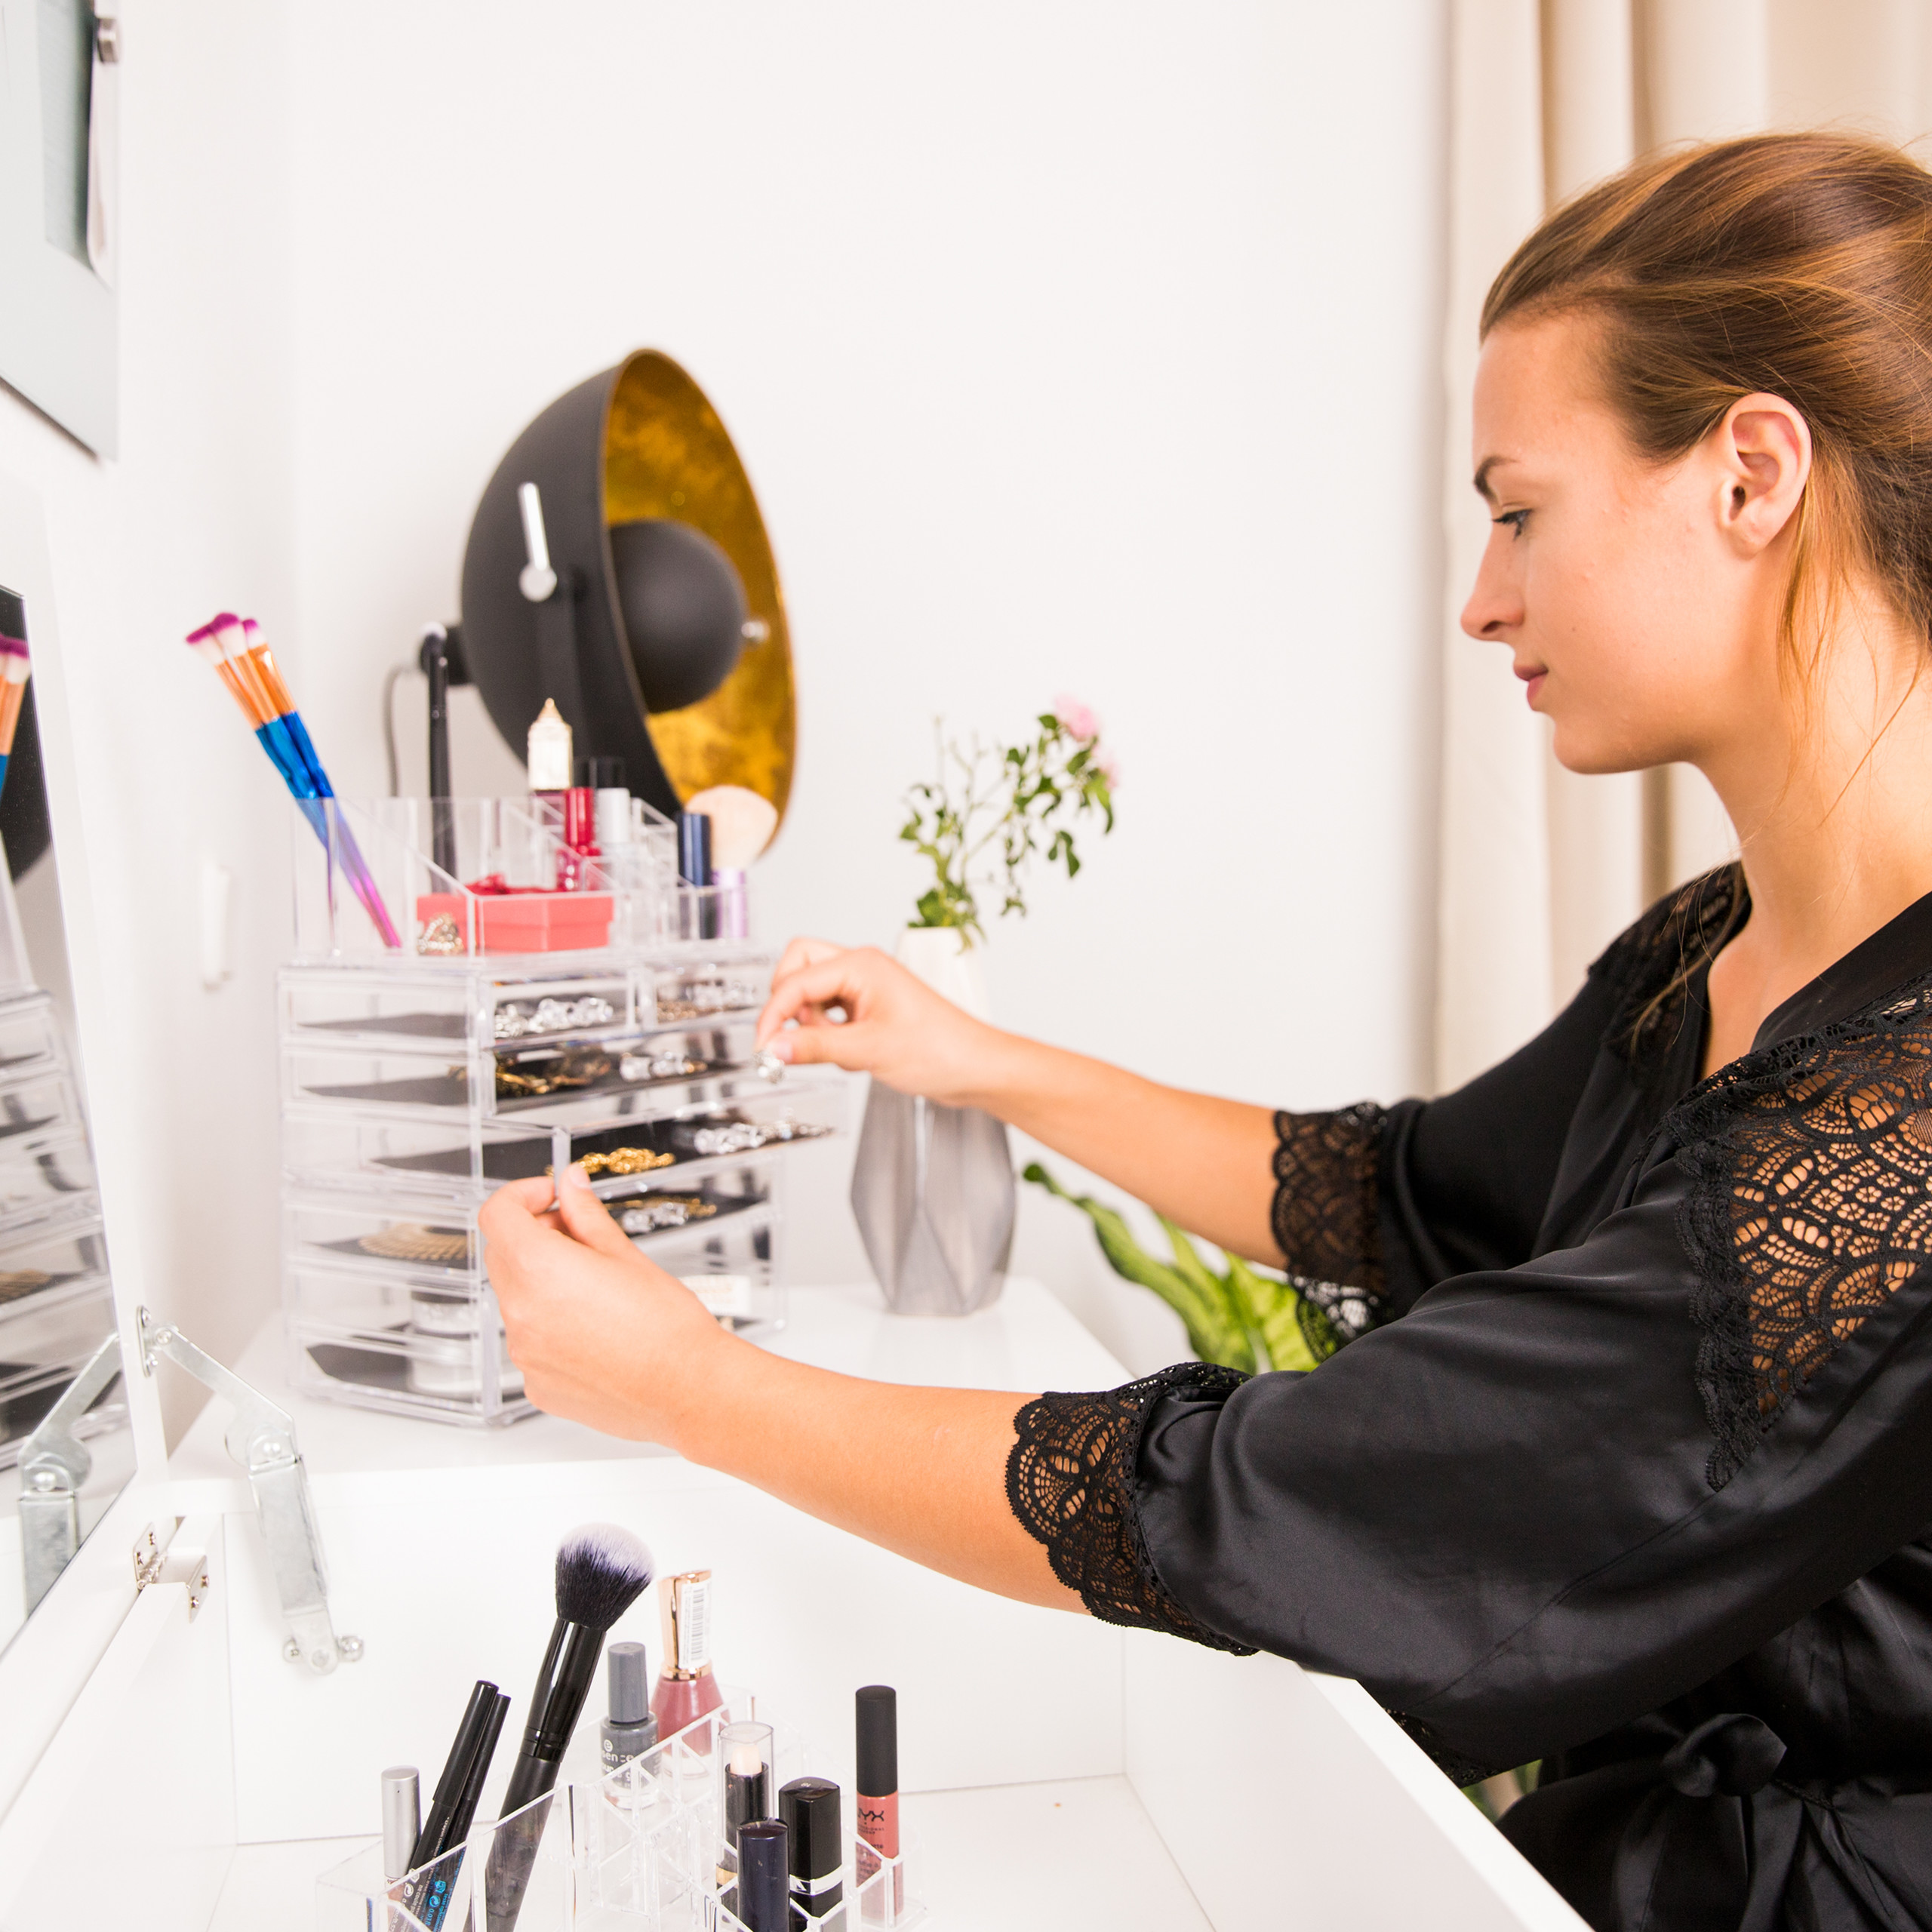 make-up-organizer-opbergen-van-cosmetica-acryl-stapelbaar-met-lades miniatuur 8